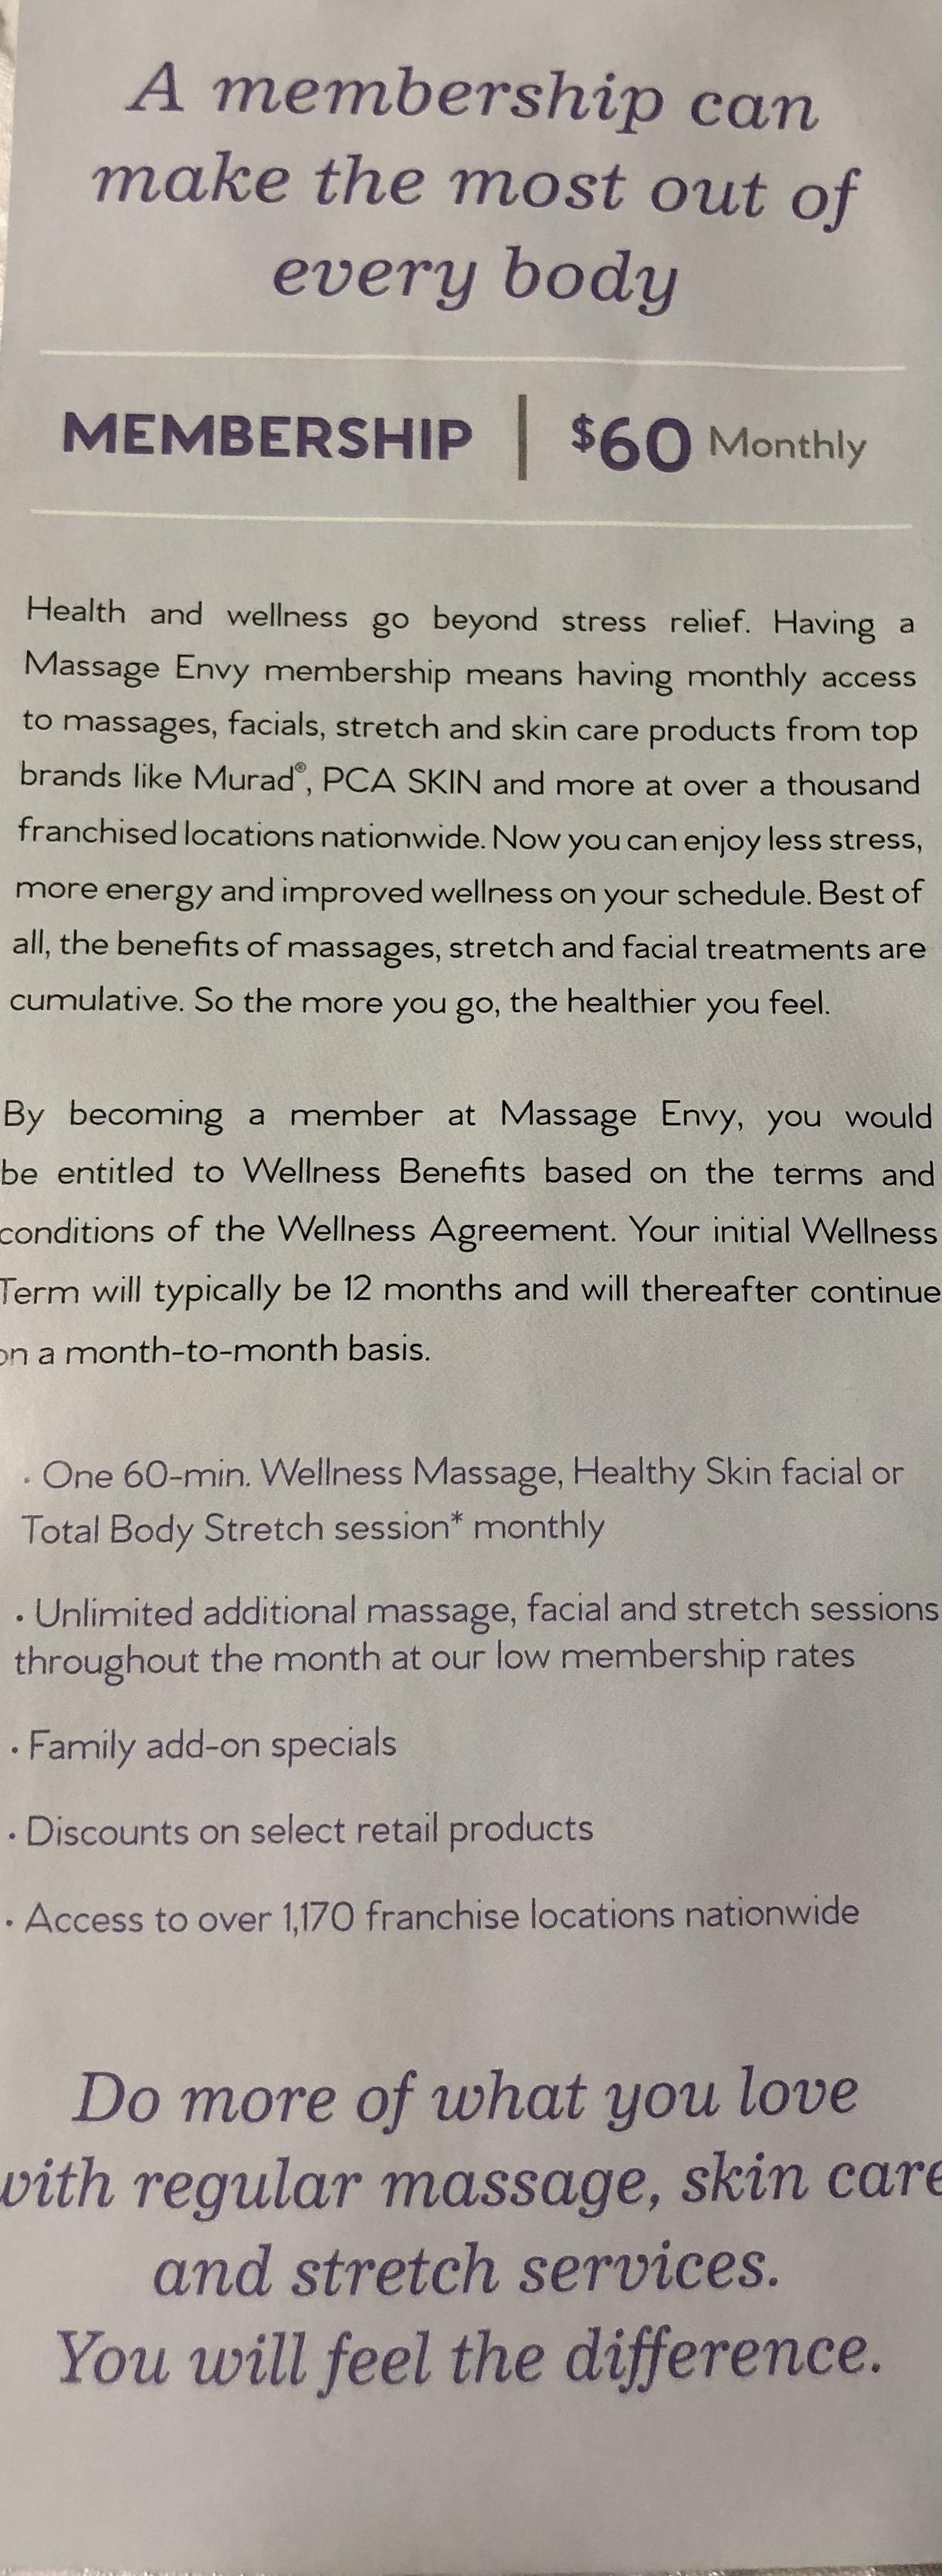 Additional Membership Details